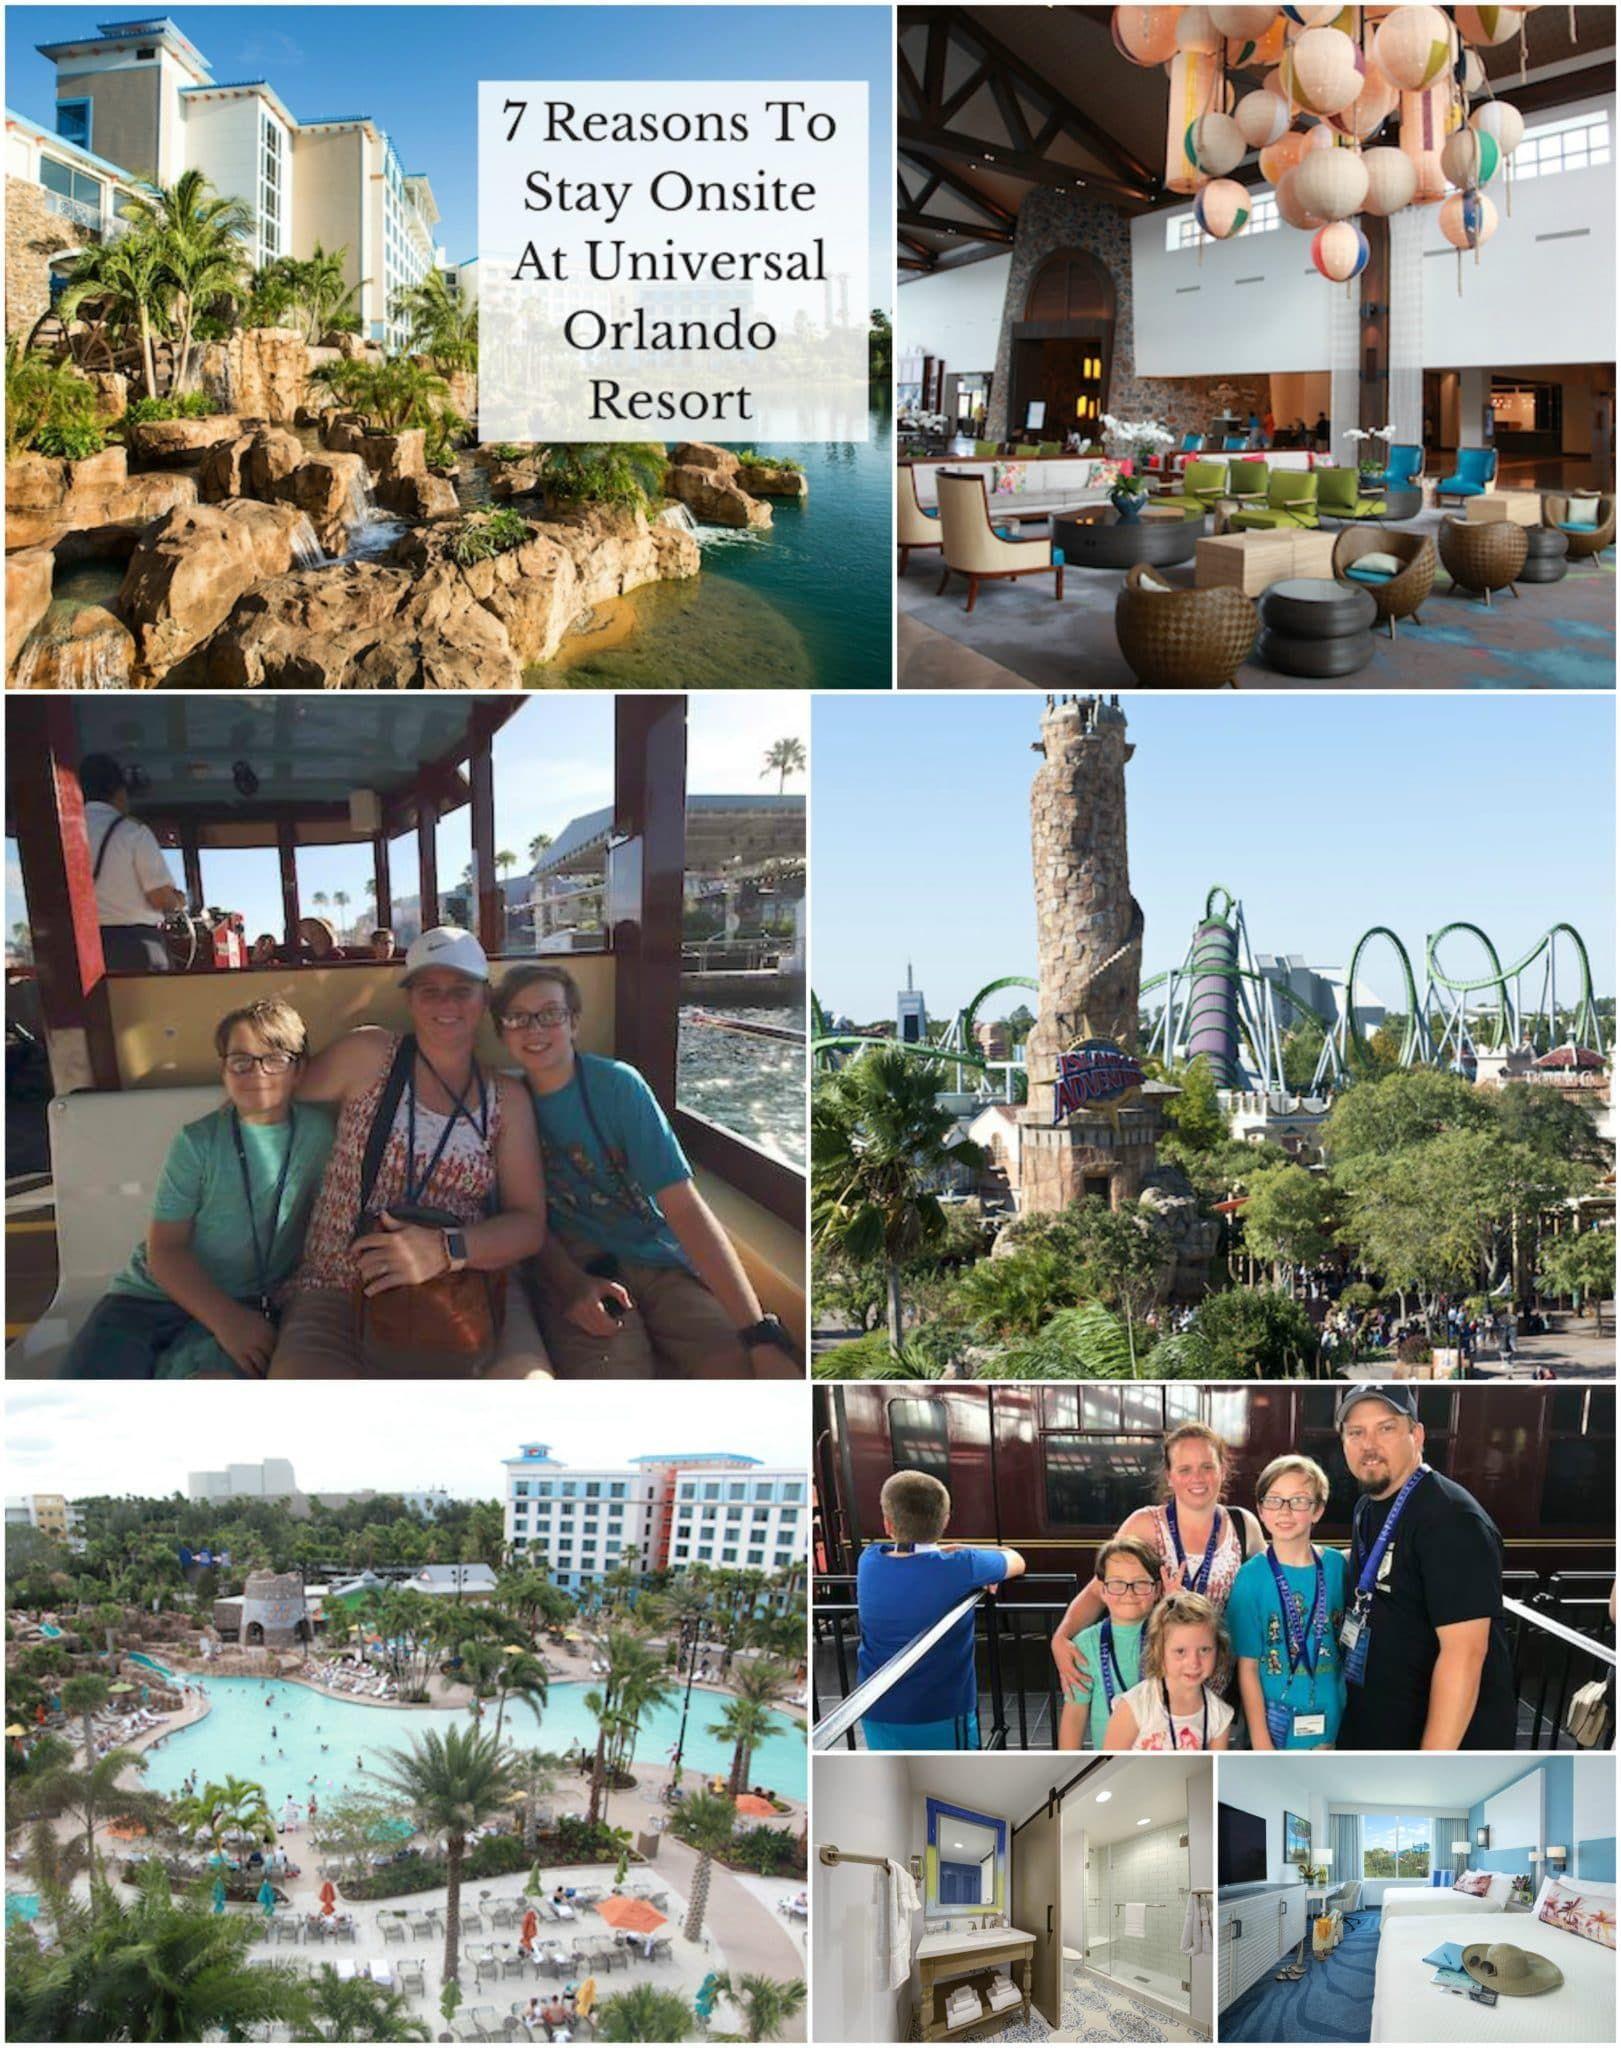 7 Reasons To Stay At An Onsite Hotel Universal Studios Orlando Resort Vacation Florida Floridavacationsummer